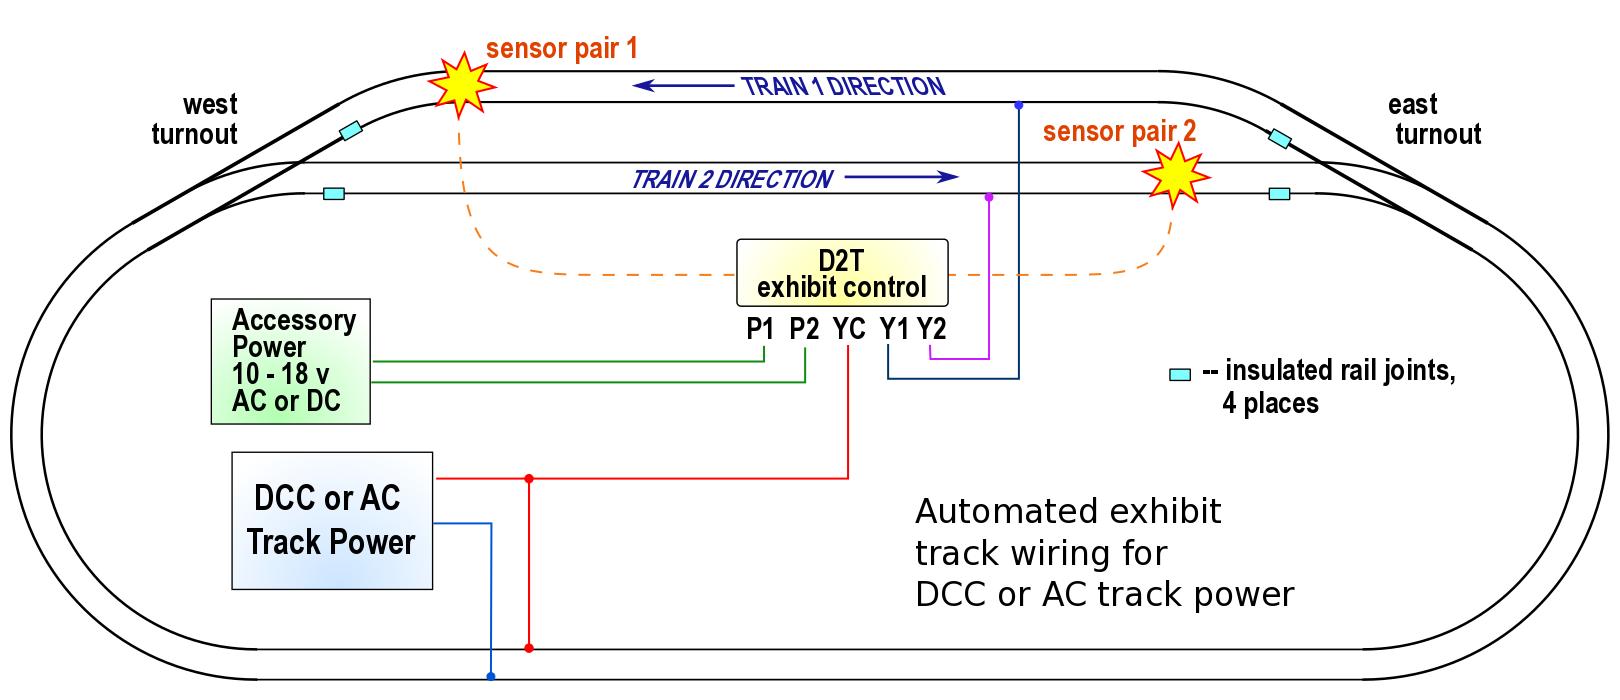 loop wiring diagram for ac or dcc [ 1620 x 700 Pixel ]